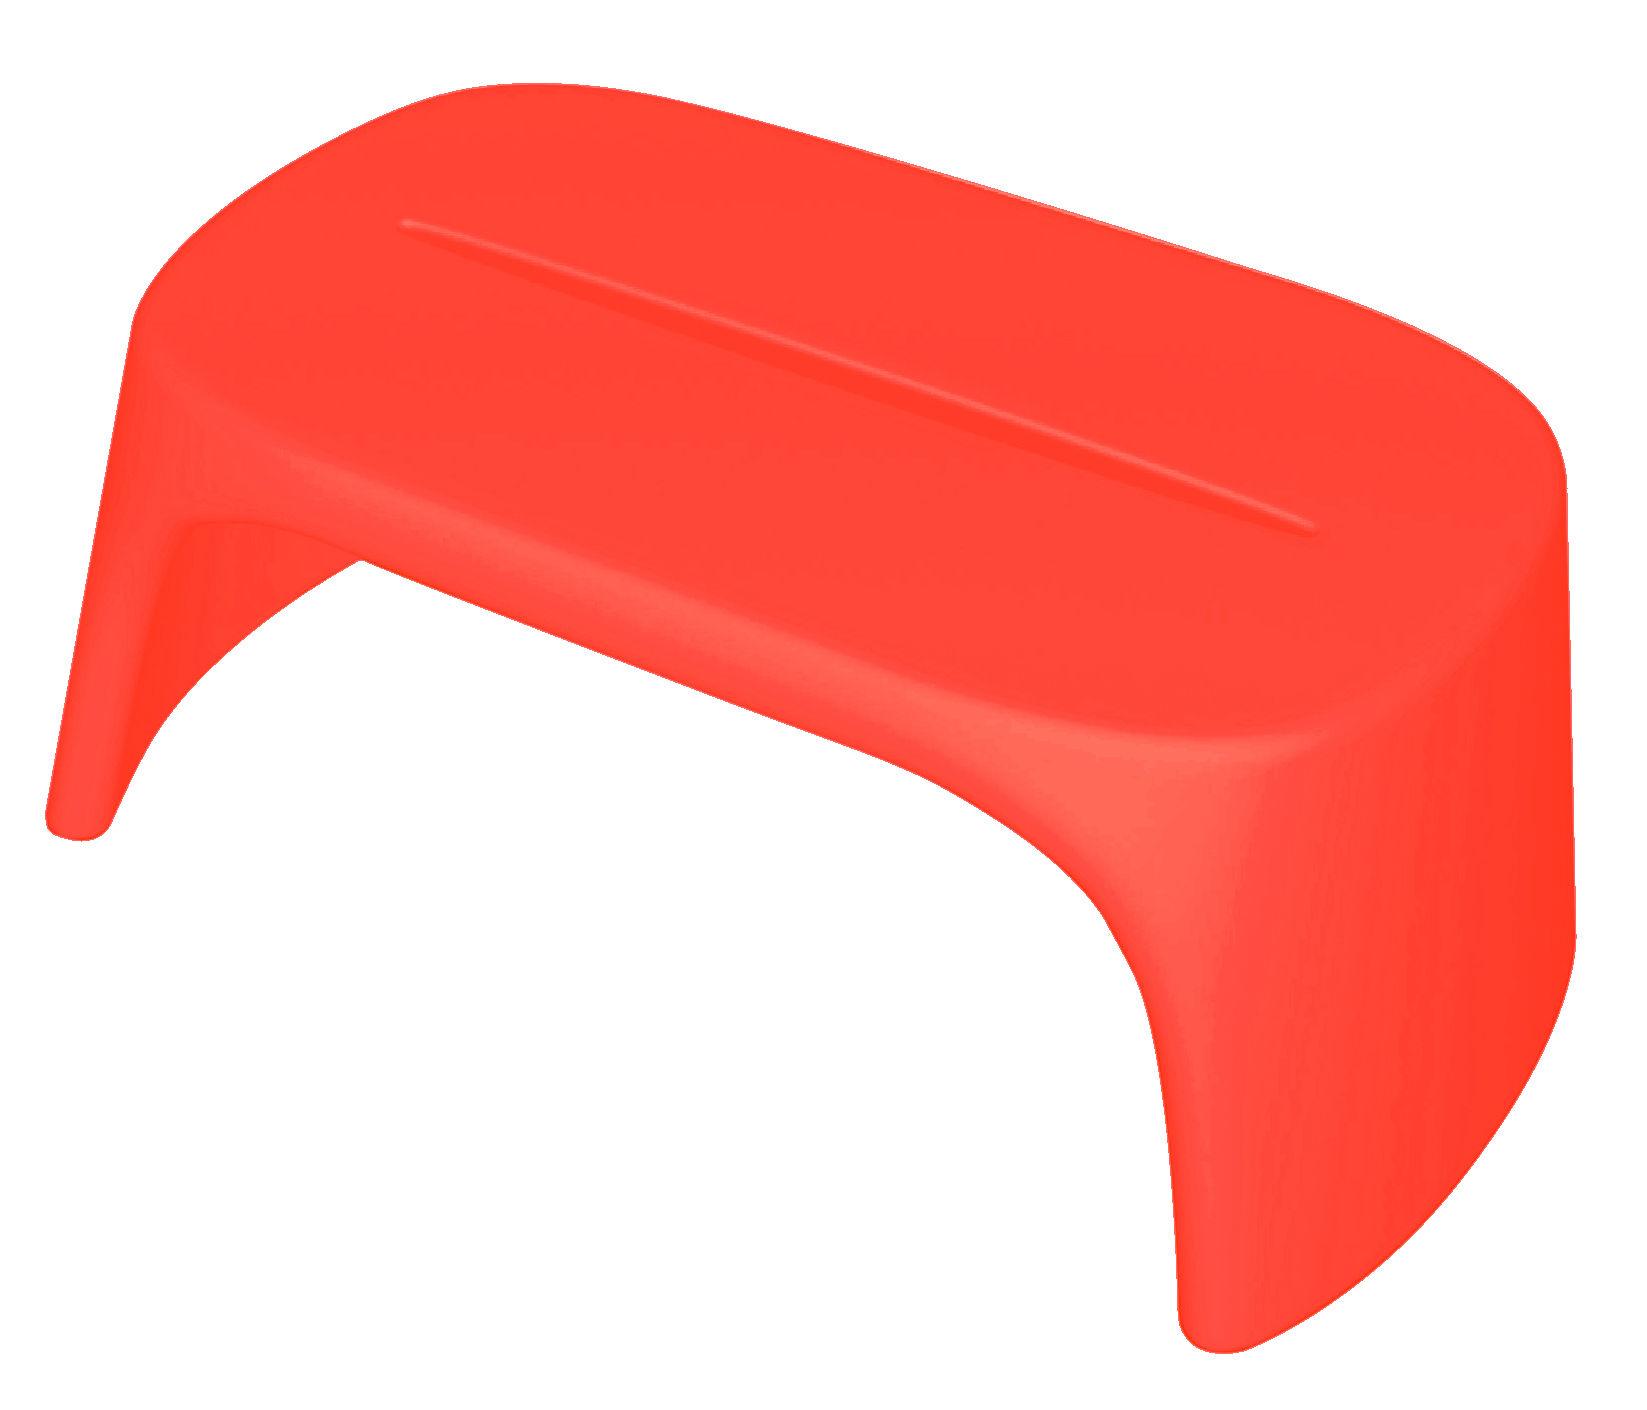 Möbel - Couchtische - Amélie Couchtisch / Bank - Slide - Rot - Polyäthylen